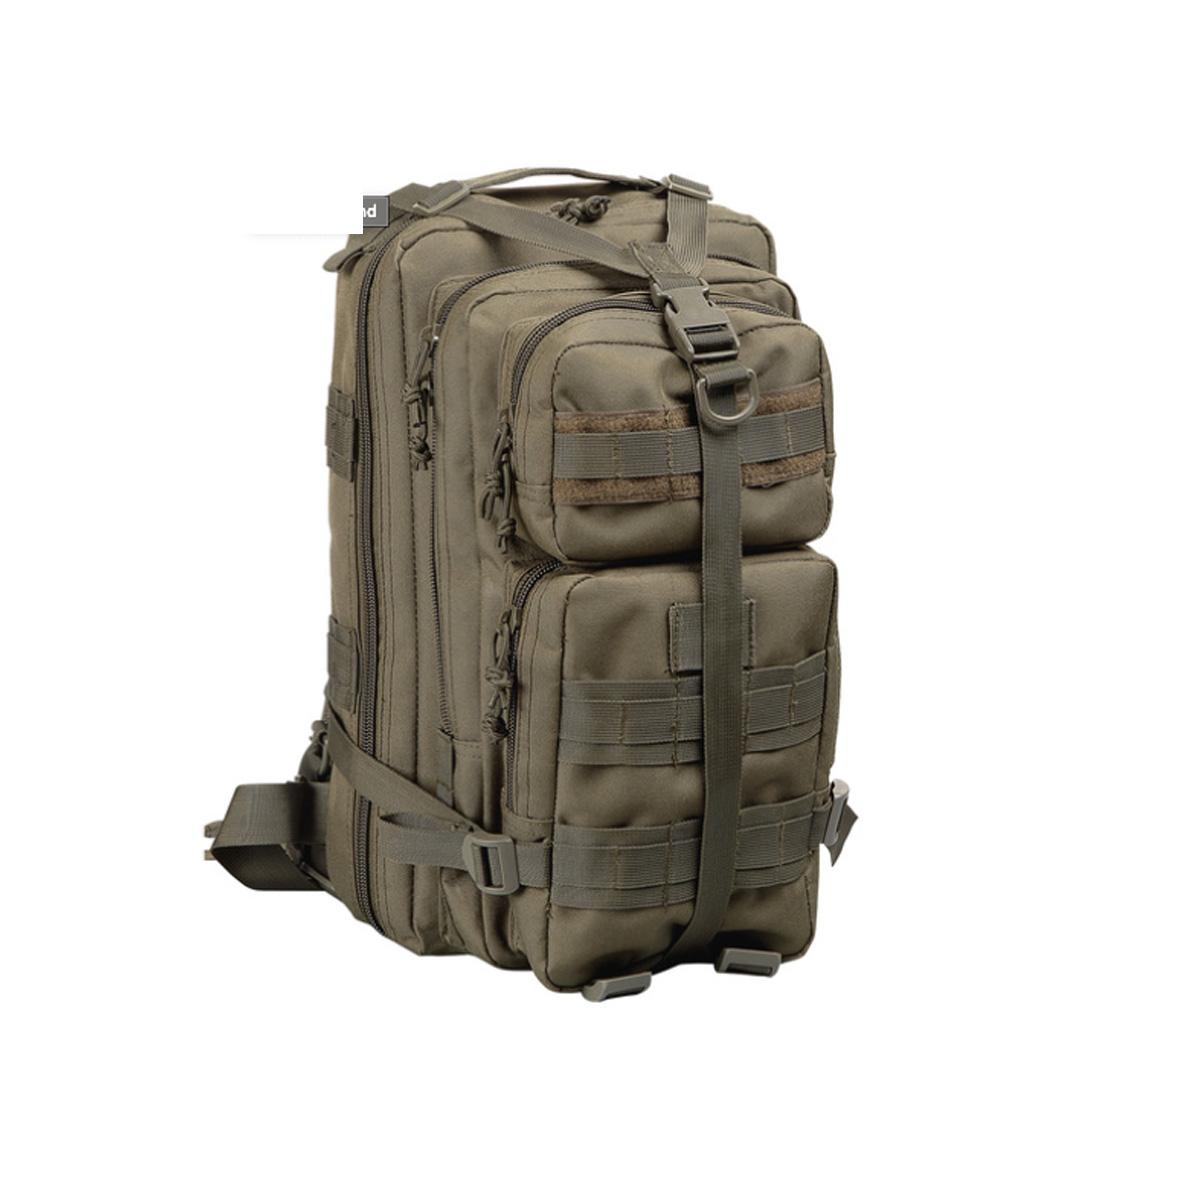 Medium Tactical Transport Backpack, Dkgreen,Moss,Olive,Forest, swatch